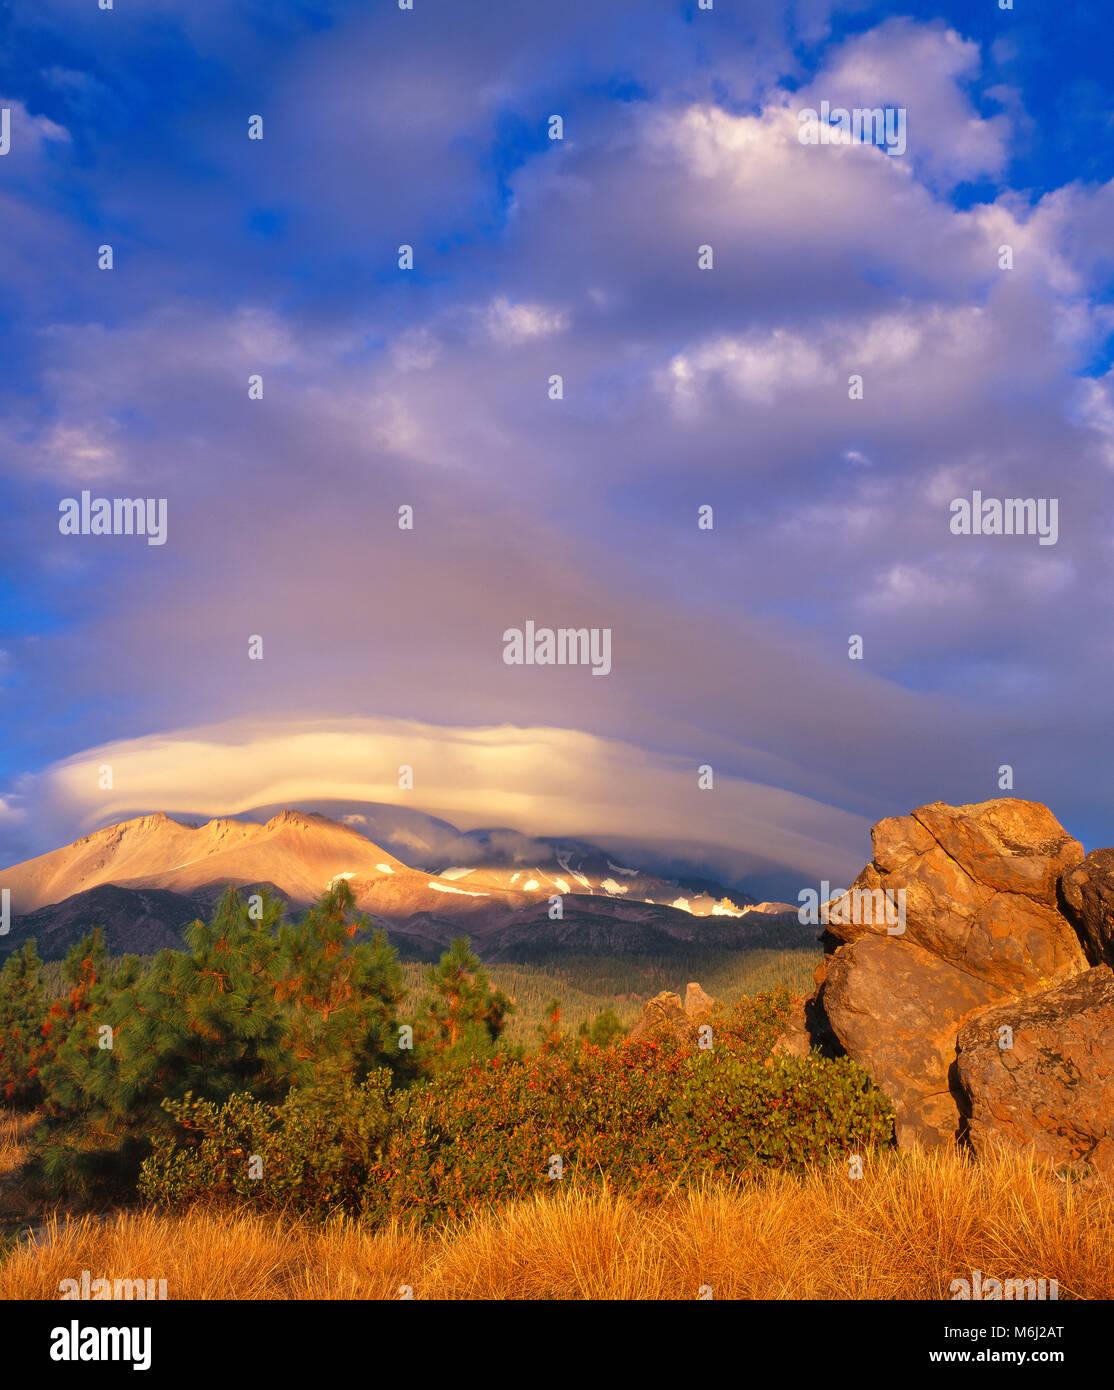 Nube lenticolare, Shastina, Mount Shasta, Shasta-Trinity National Forest, California Immagini Stock